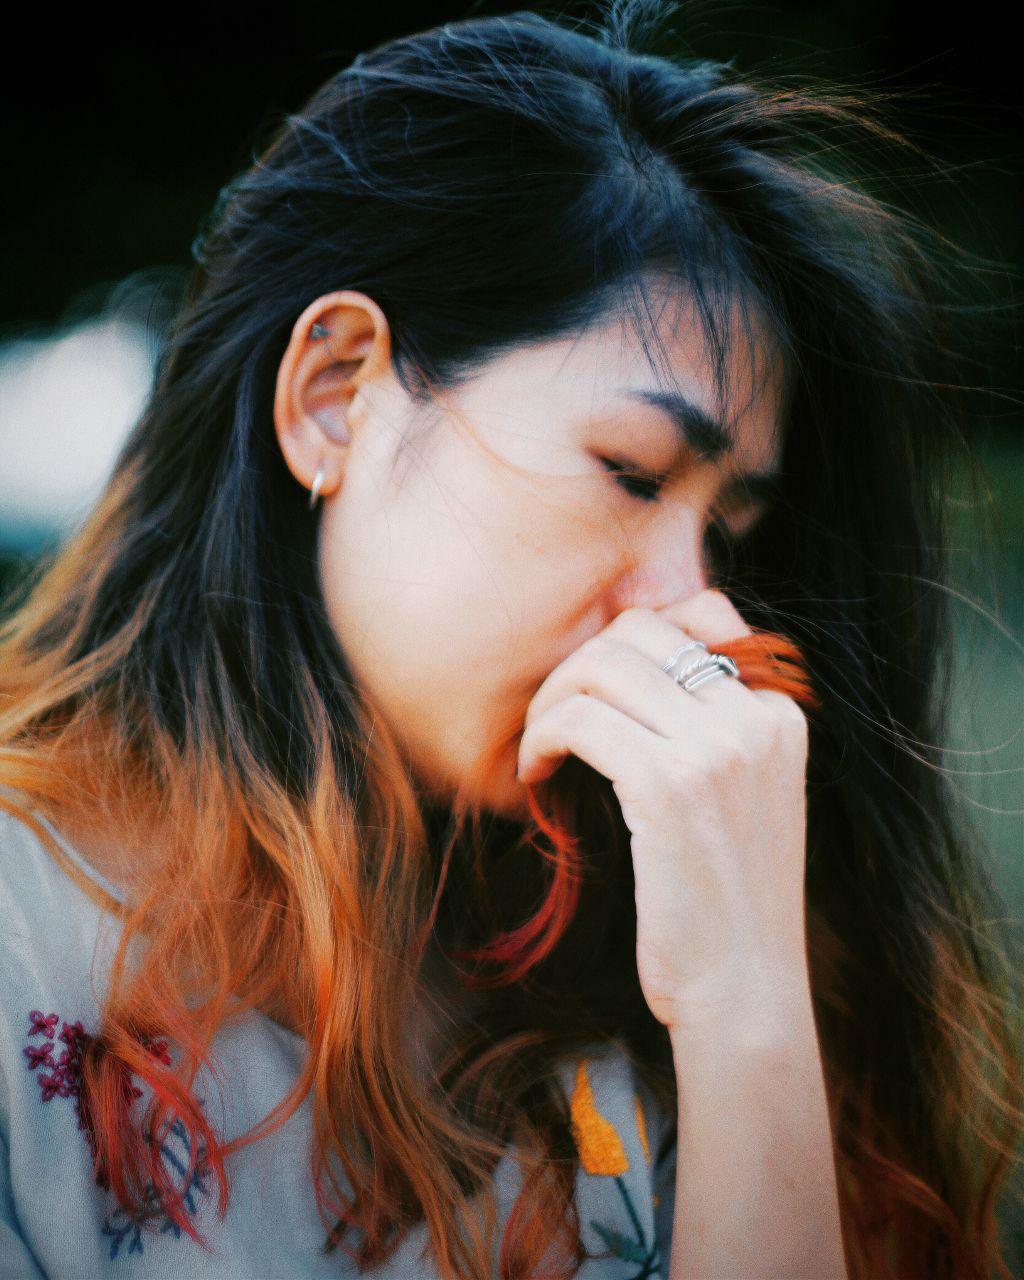 #FreeToEdit#portrait #afterlight #vscocam #vscovietnam #vscofilter #vscodaily #portrait_perfection #portraits_ig #portraiture #relaxingday #haloween #intotheforest #portrait_shots #lost #wanderection #wanderer #instadaily #instagoodmyphoto